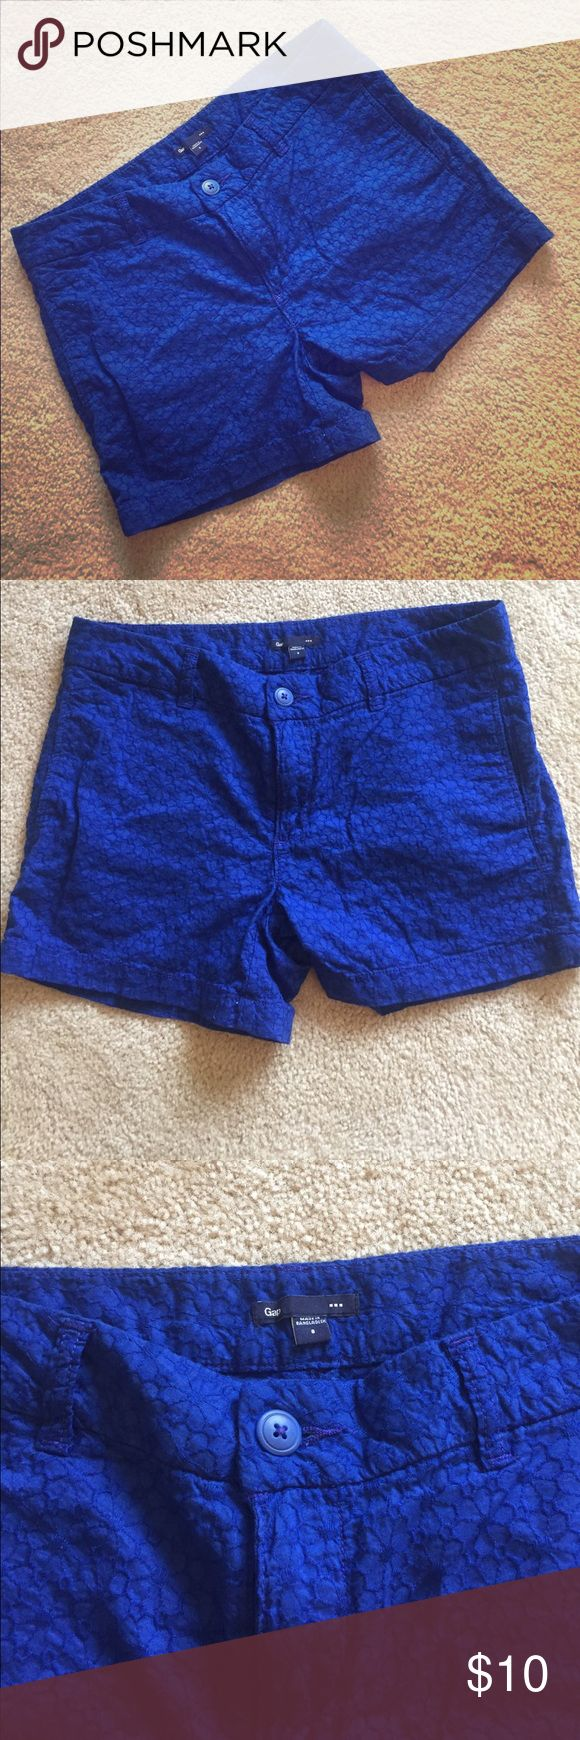 Gap blue floral shorts Bright cobalt blue, floral lace pattern. Gap factory. GAP Shorts